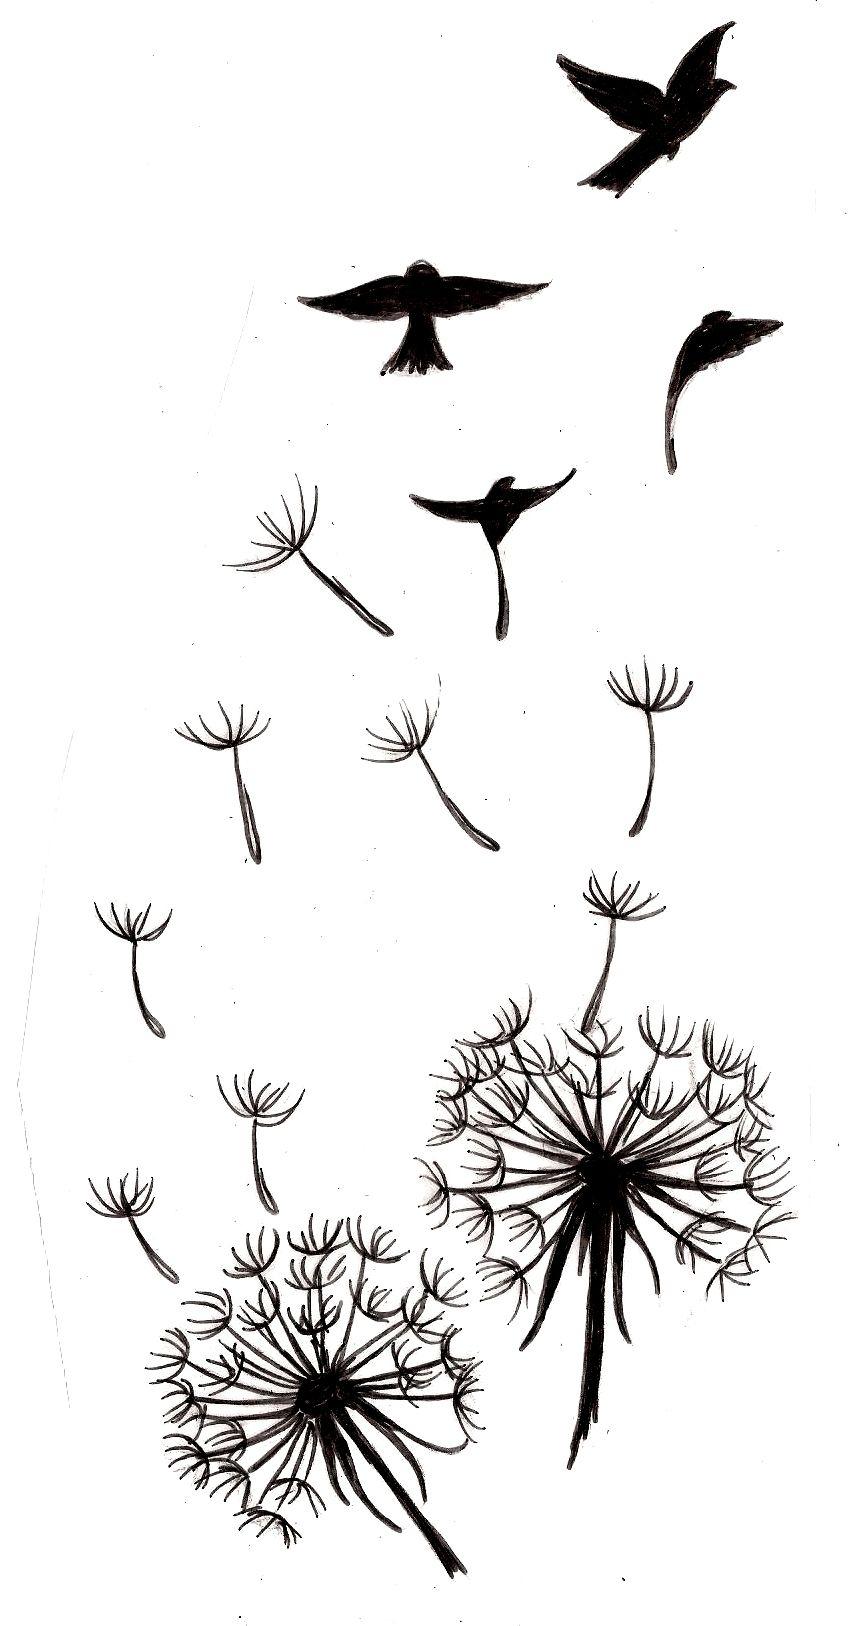 Dandelion With Bird Silhouettes Tattoo 3 Metacharis On in size 867 X 1626